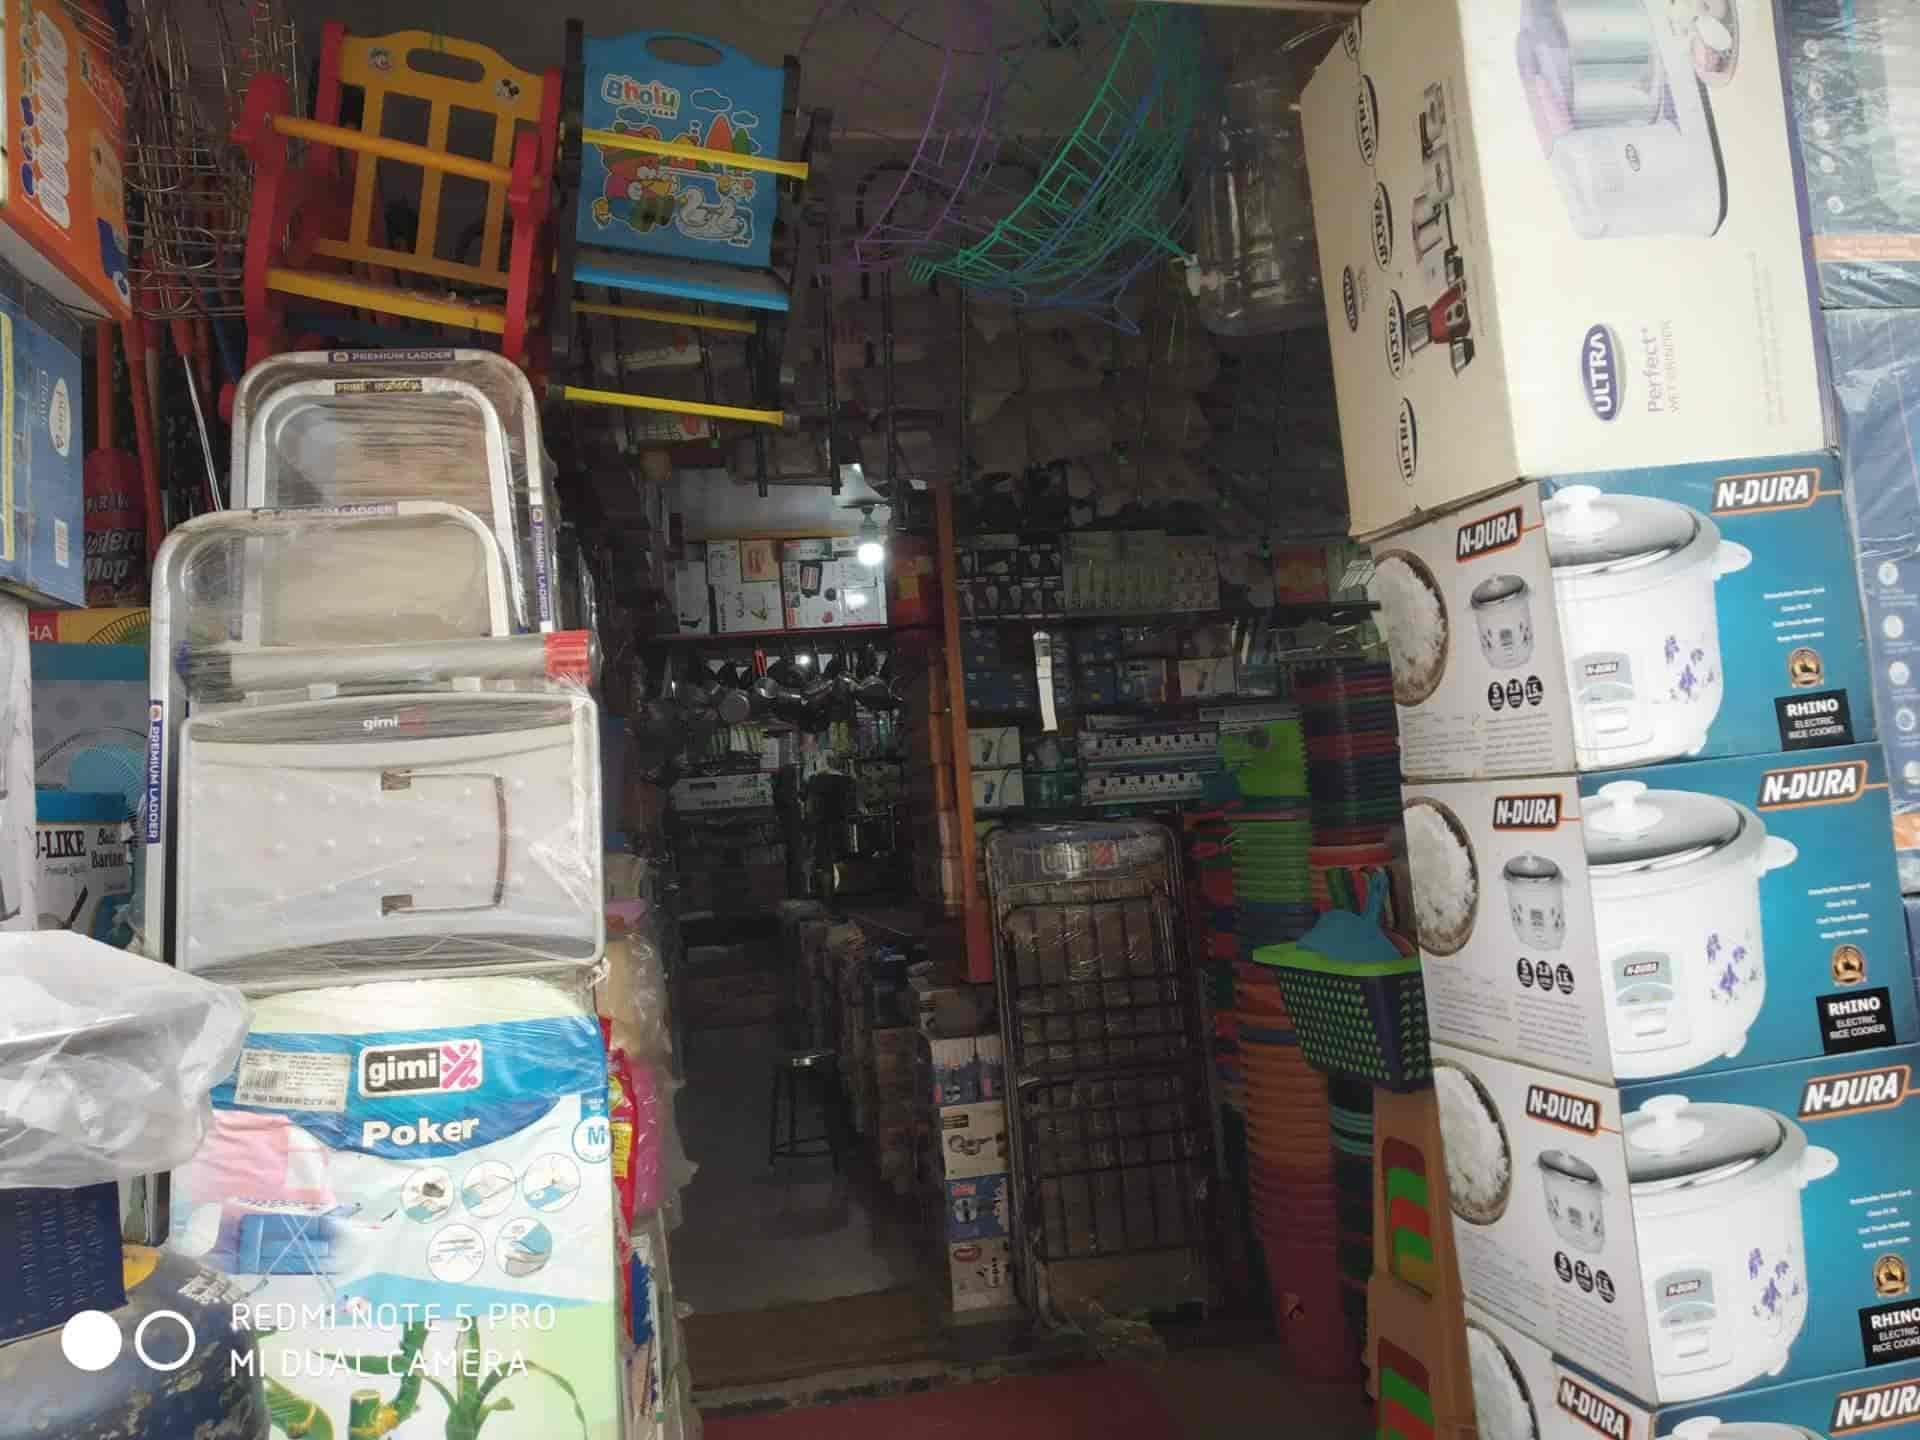 Maharaja Home Appliances, Electronic City - Gas Stove Repair